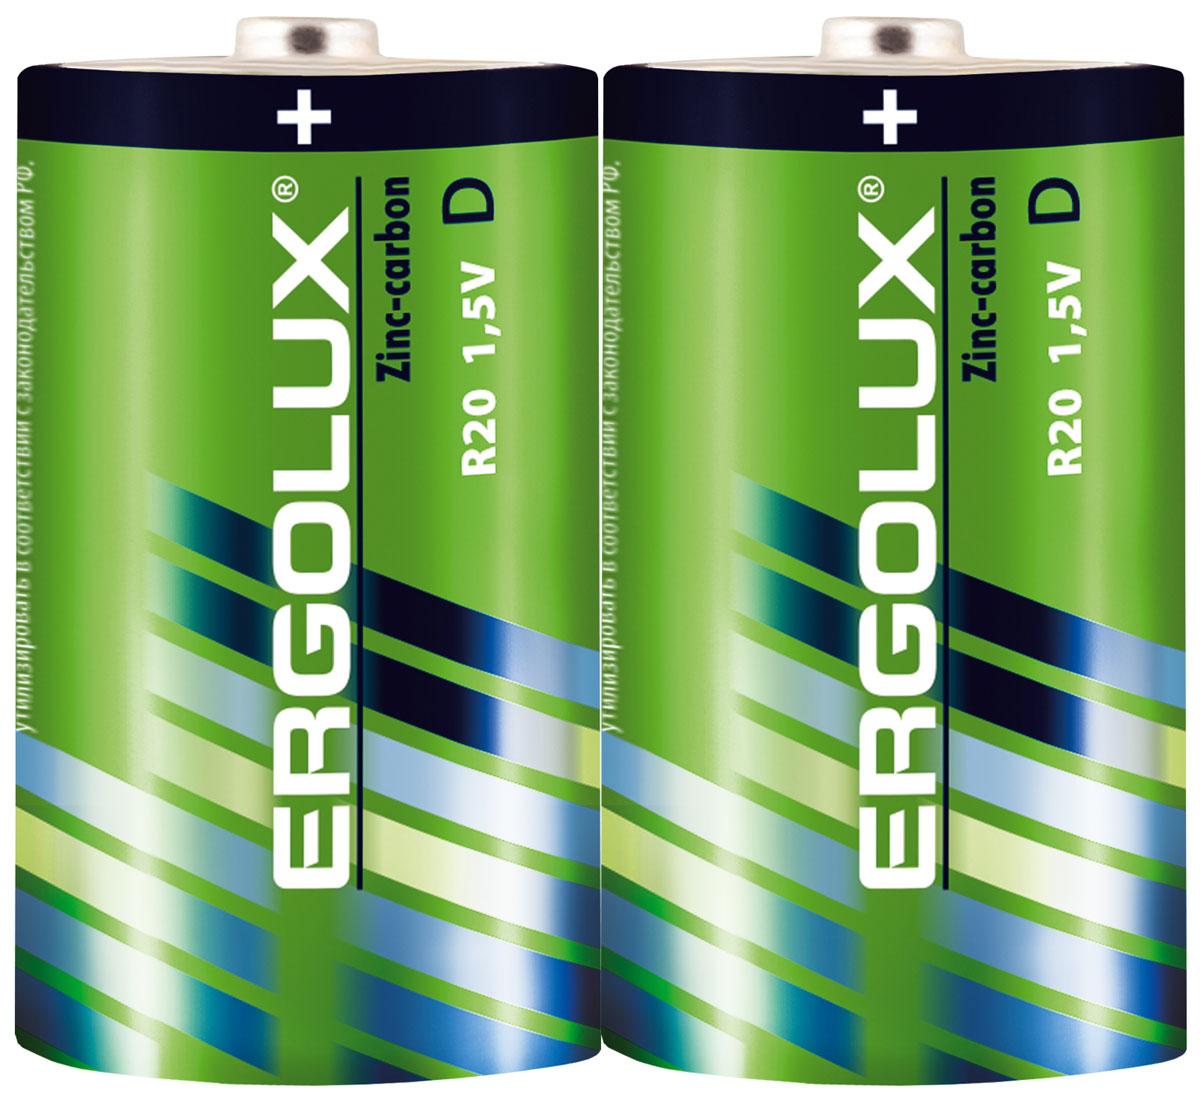 Батарейка солевая Ergolux, тип R20 SR2, 1,5 В, 2 шт